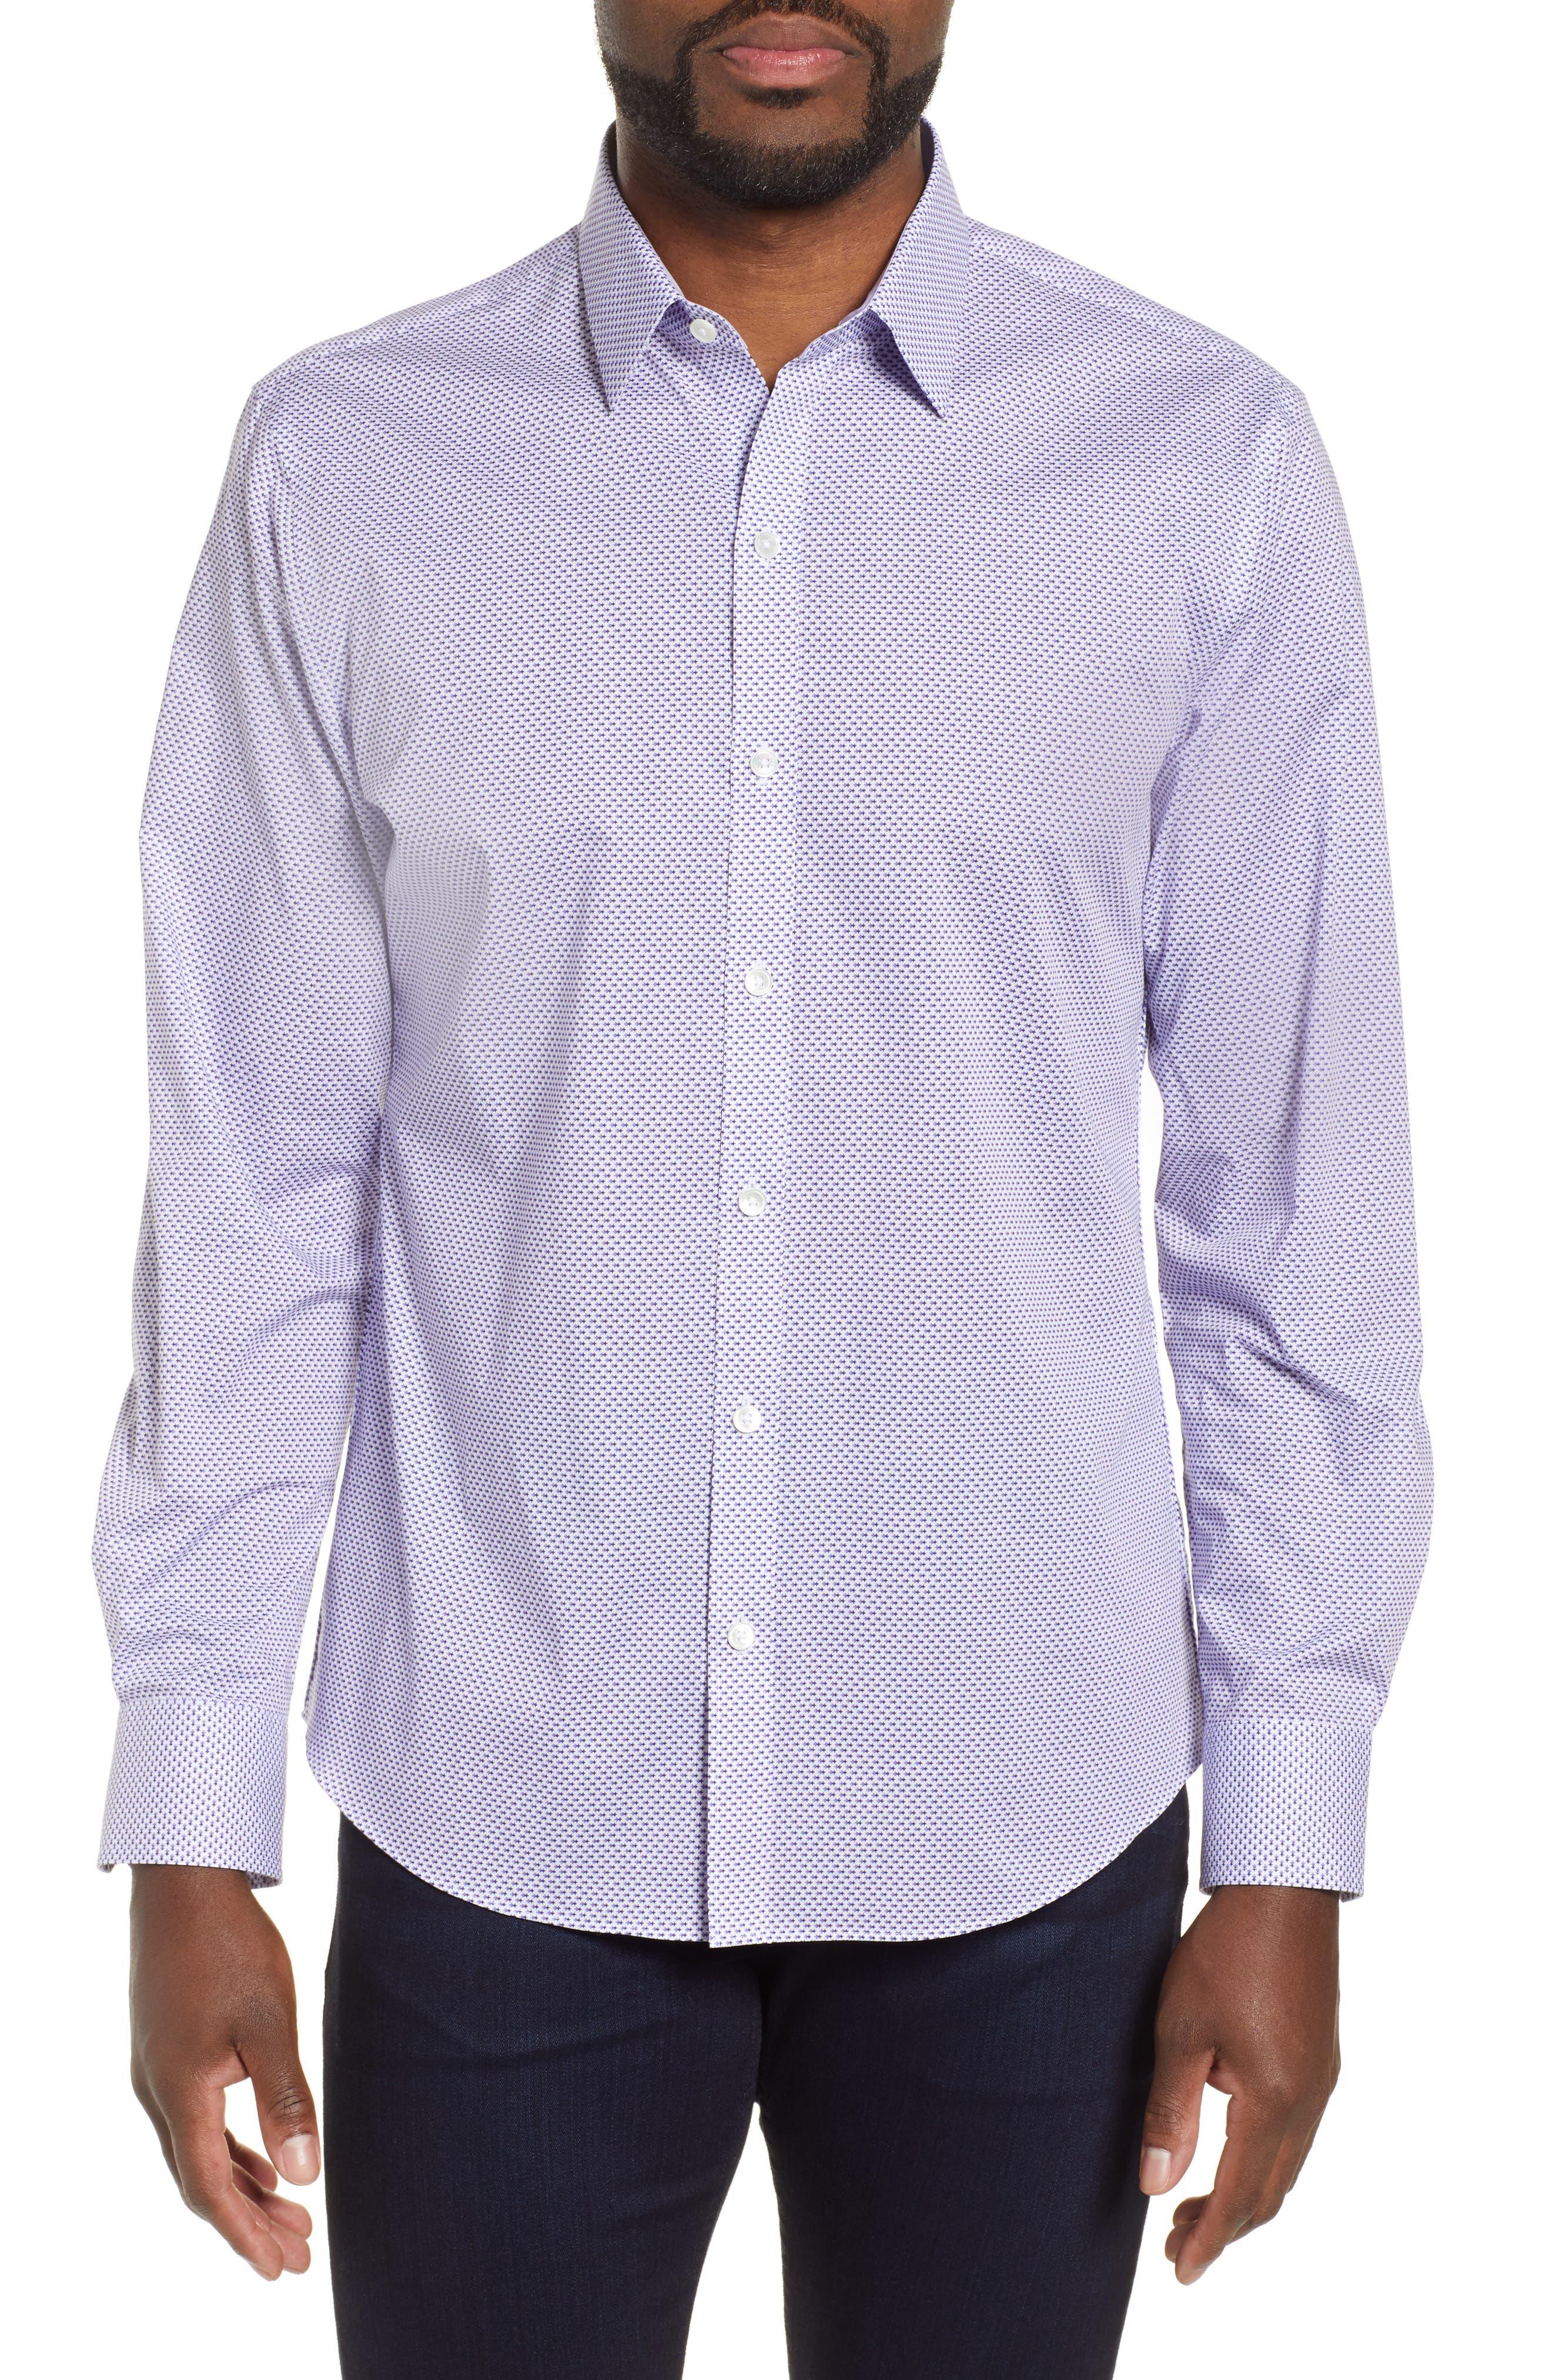 ZACHARY PRELL Wilson Regular Fit Micro Print Sport Shirt, Main, color, PURPLE